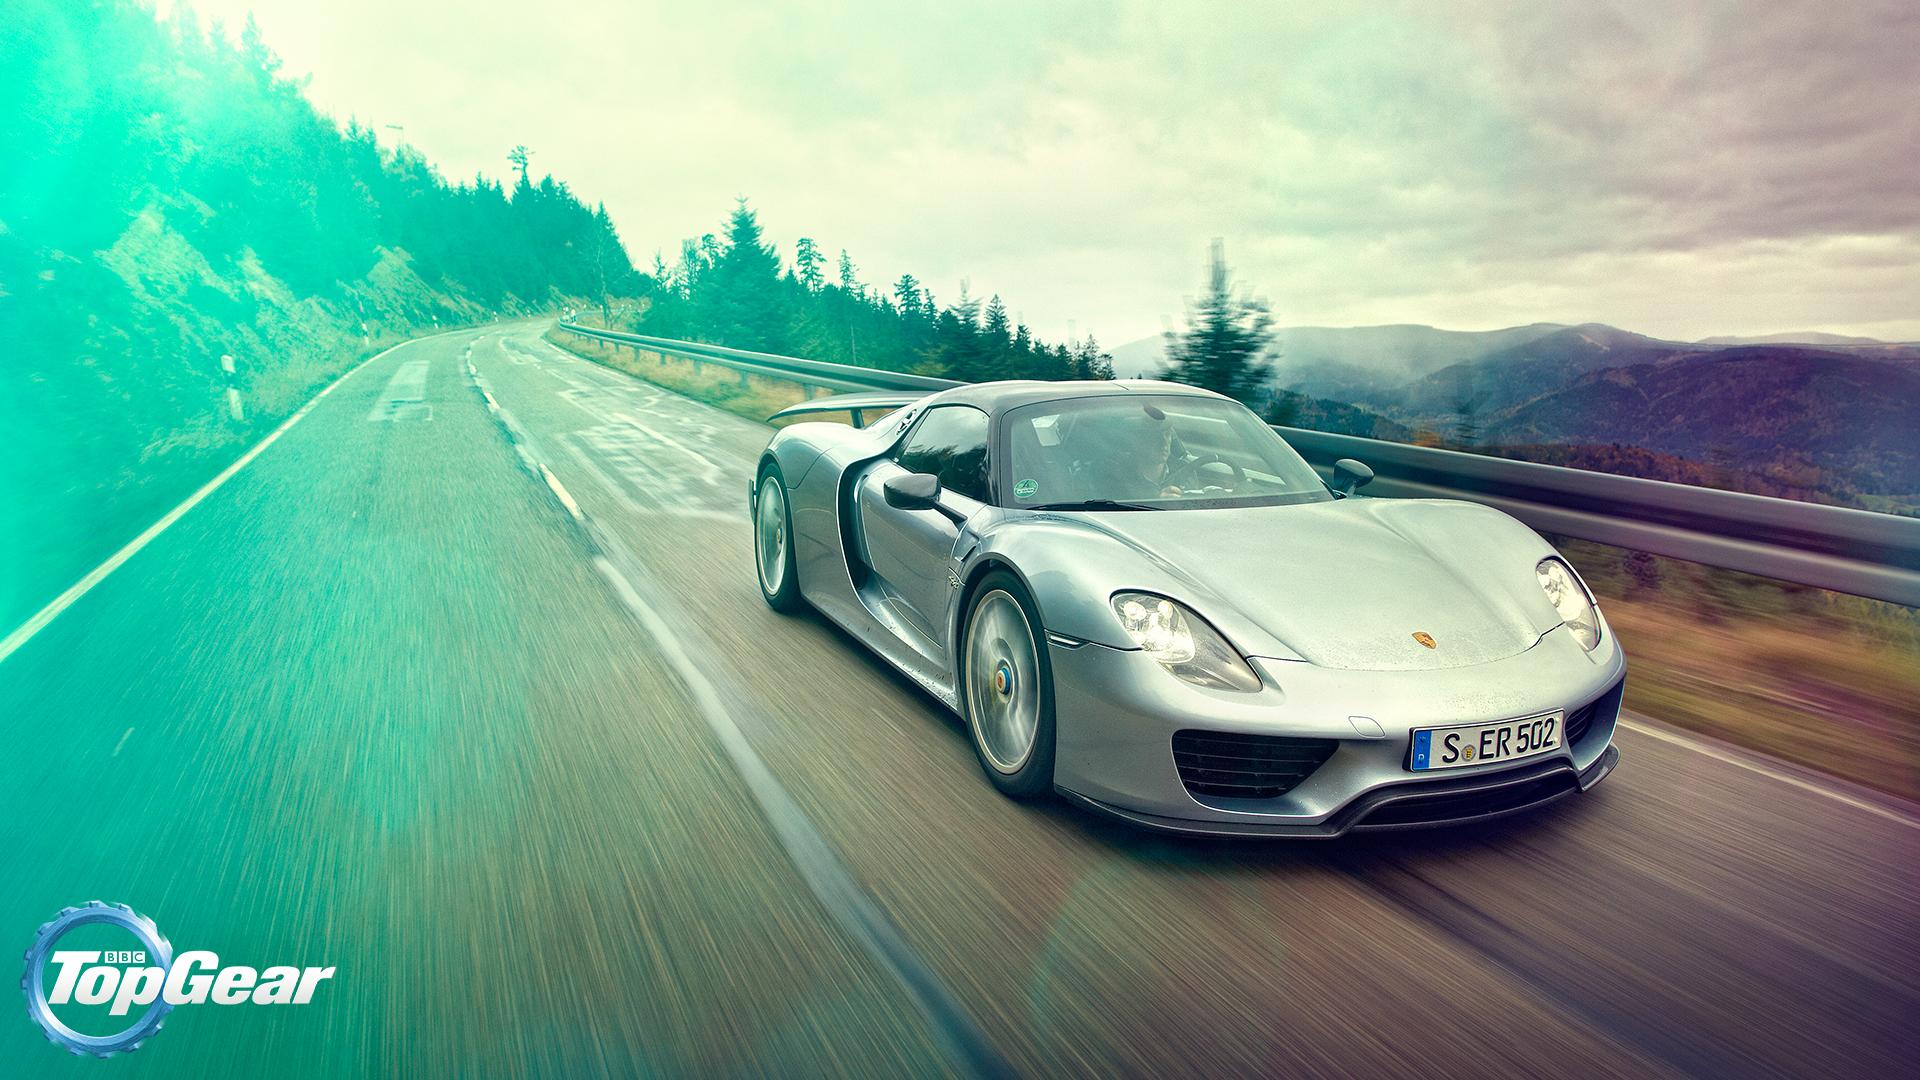 918Large1 Remarkable Porsche 918 Spyder Concept top Gear Cars Trend